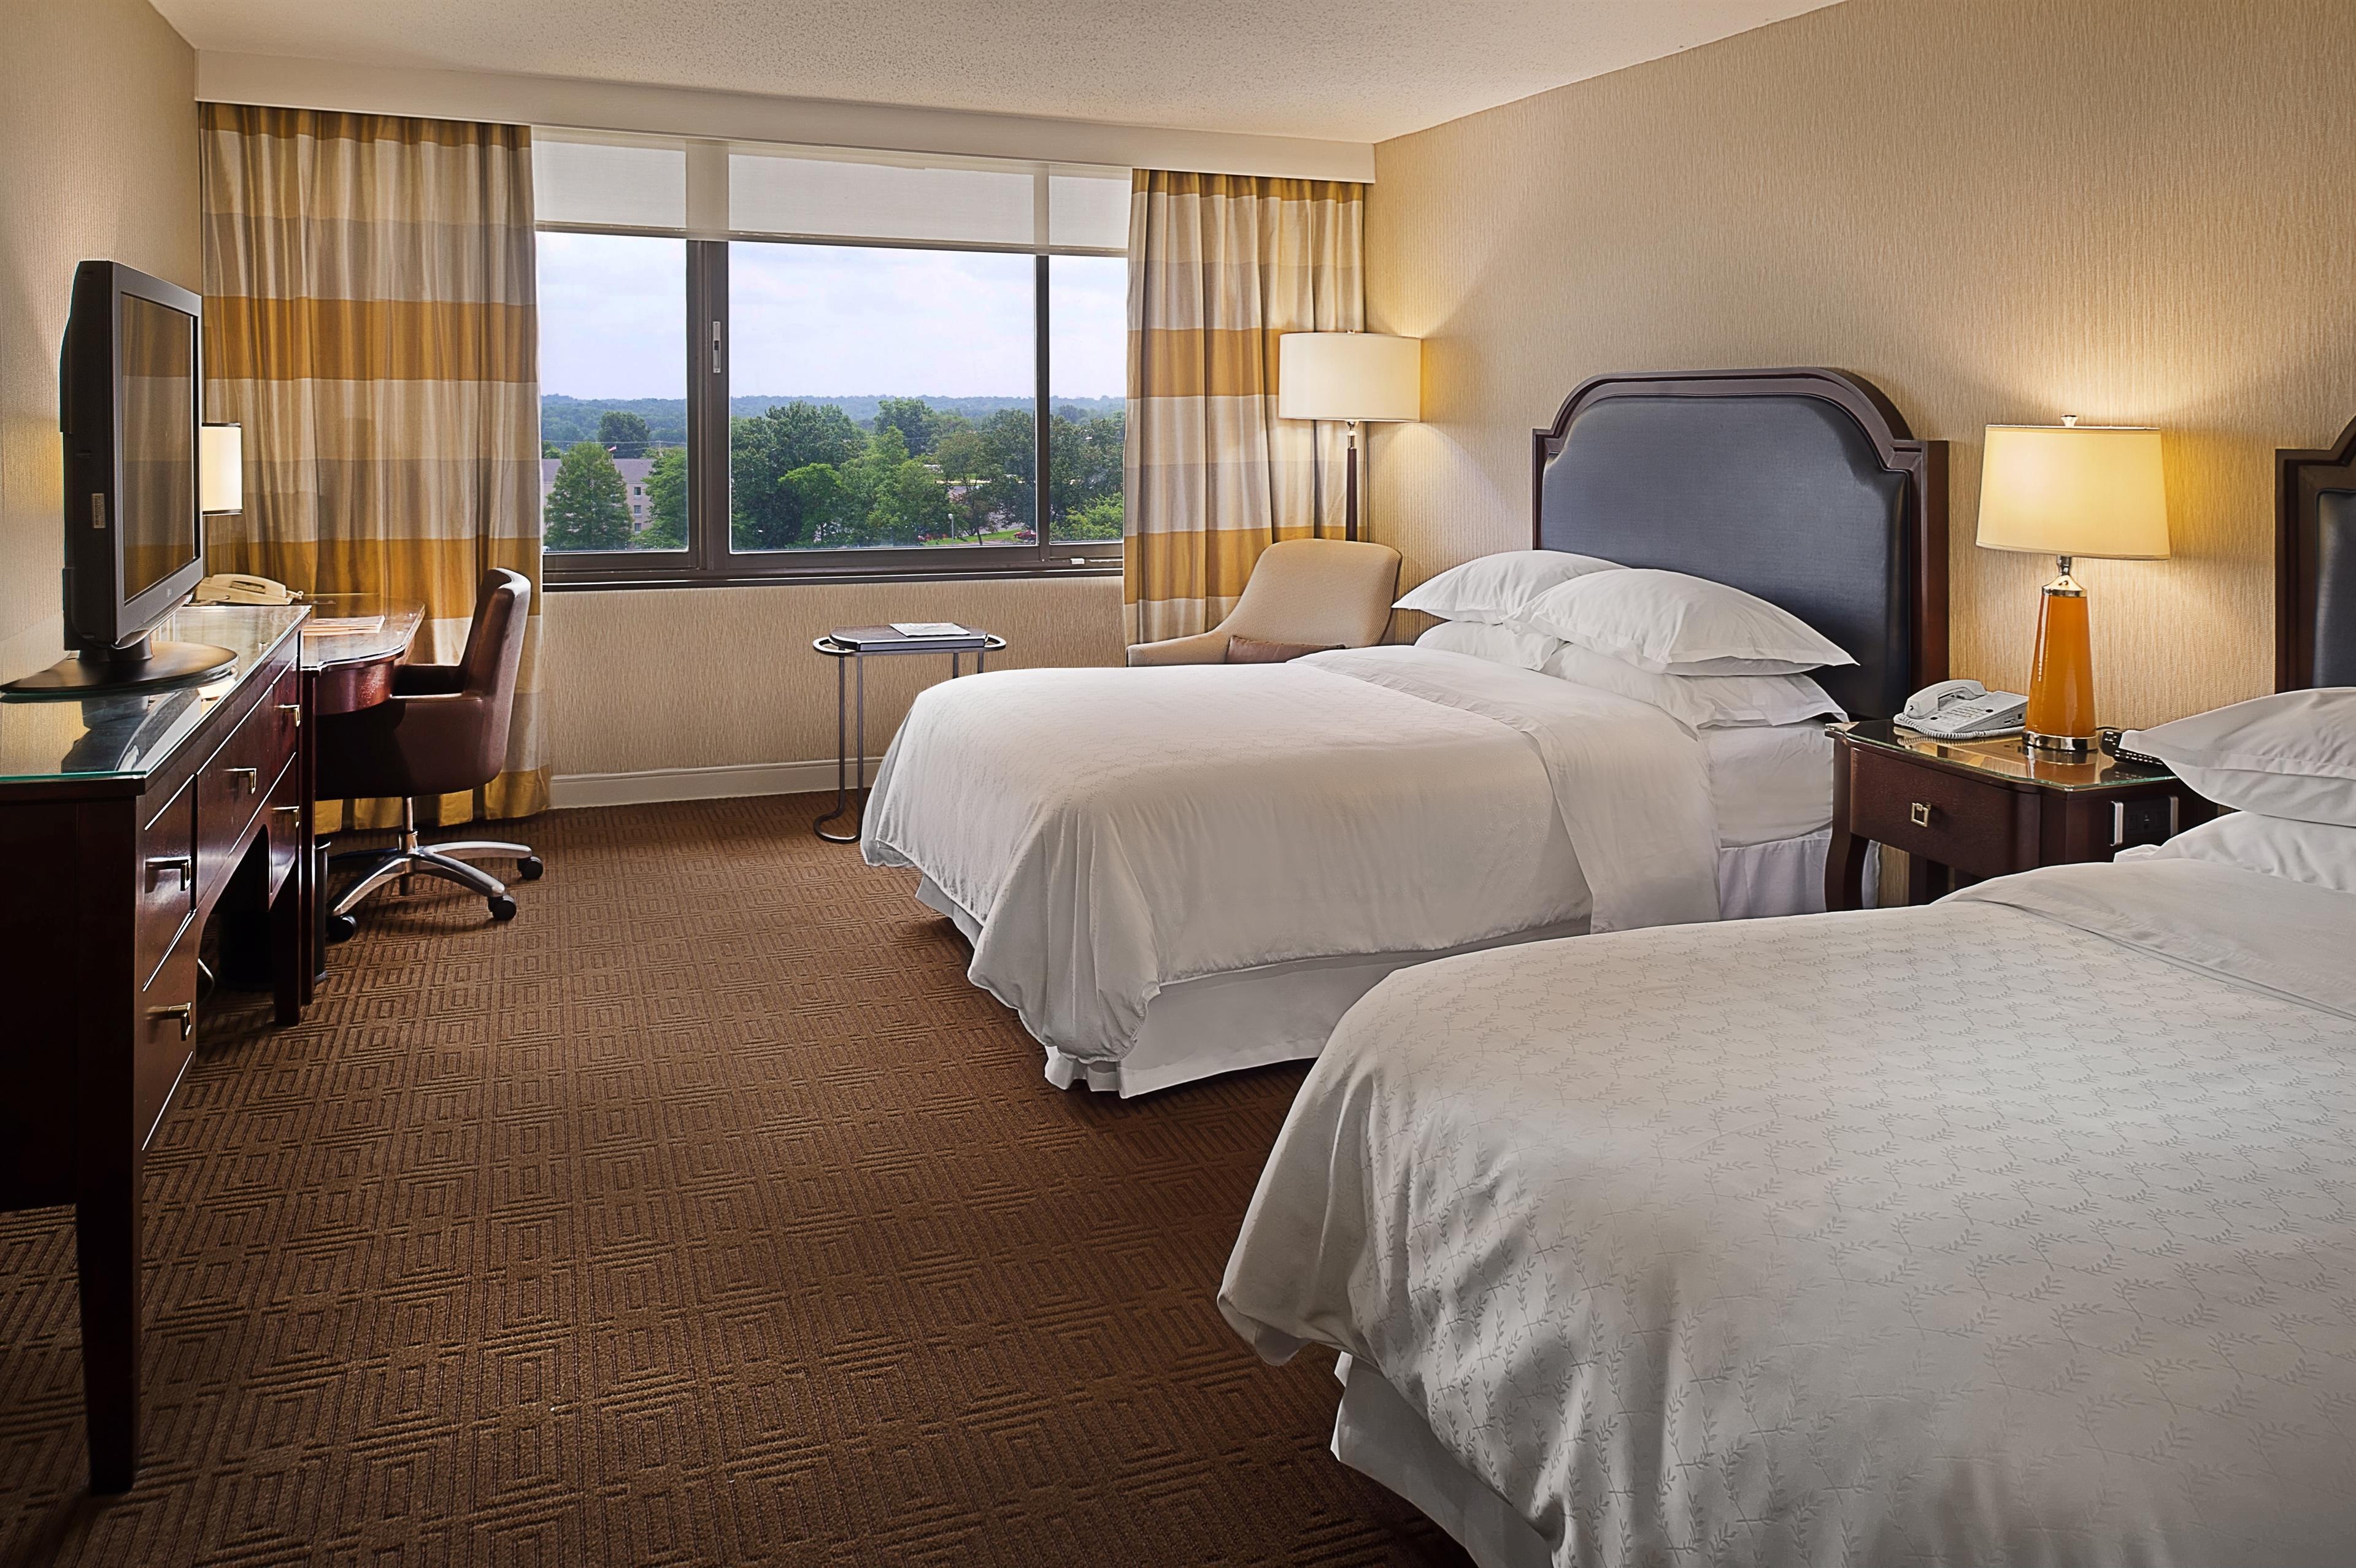 Sheraton Westport Plaza Hotel St. Louis image 28